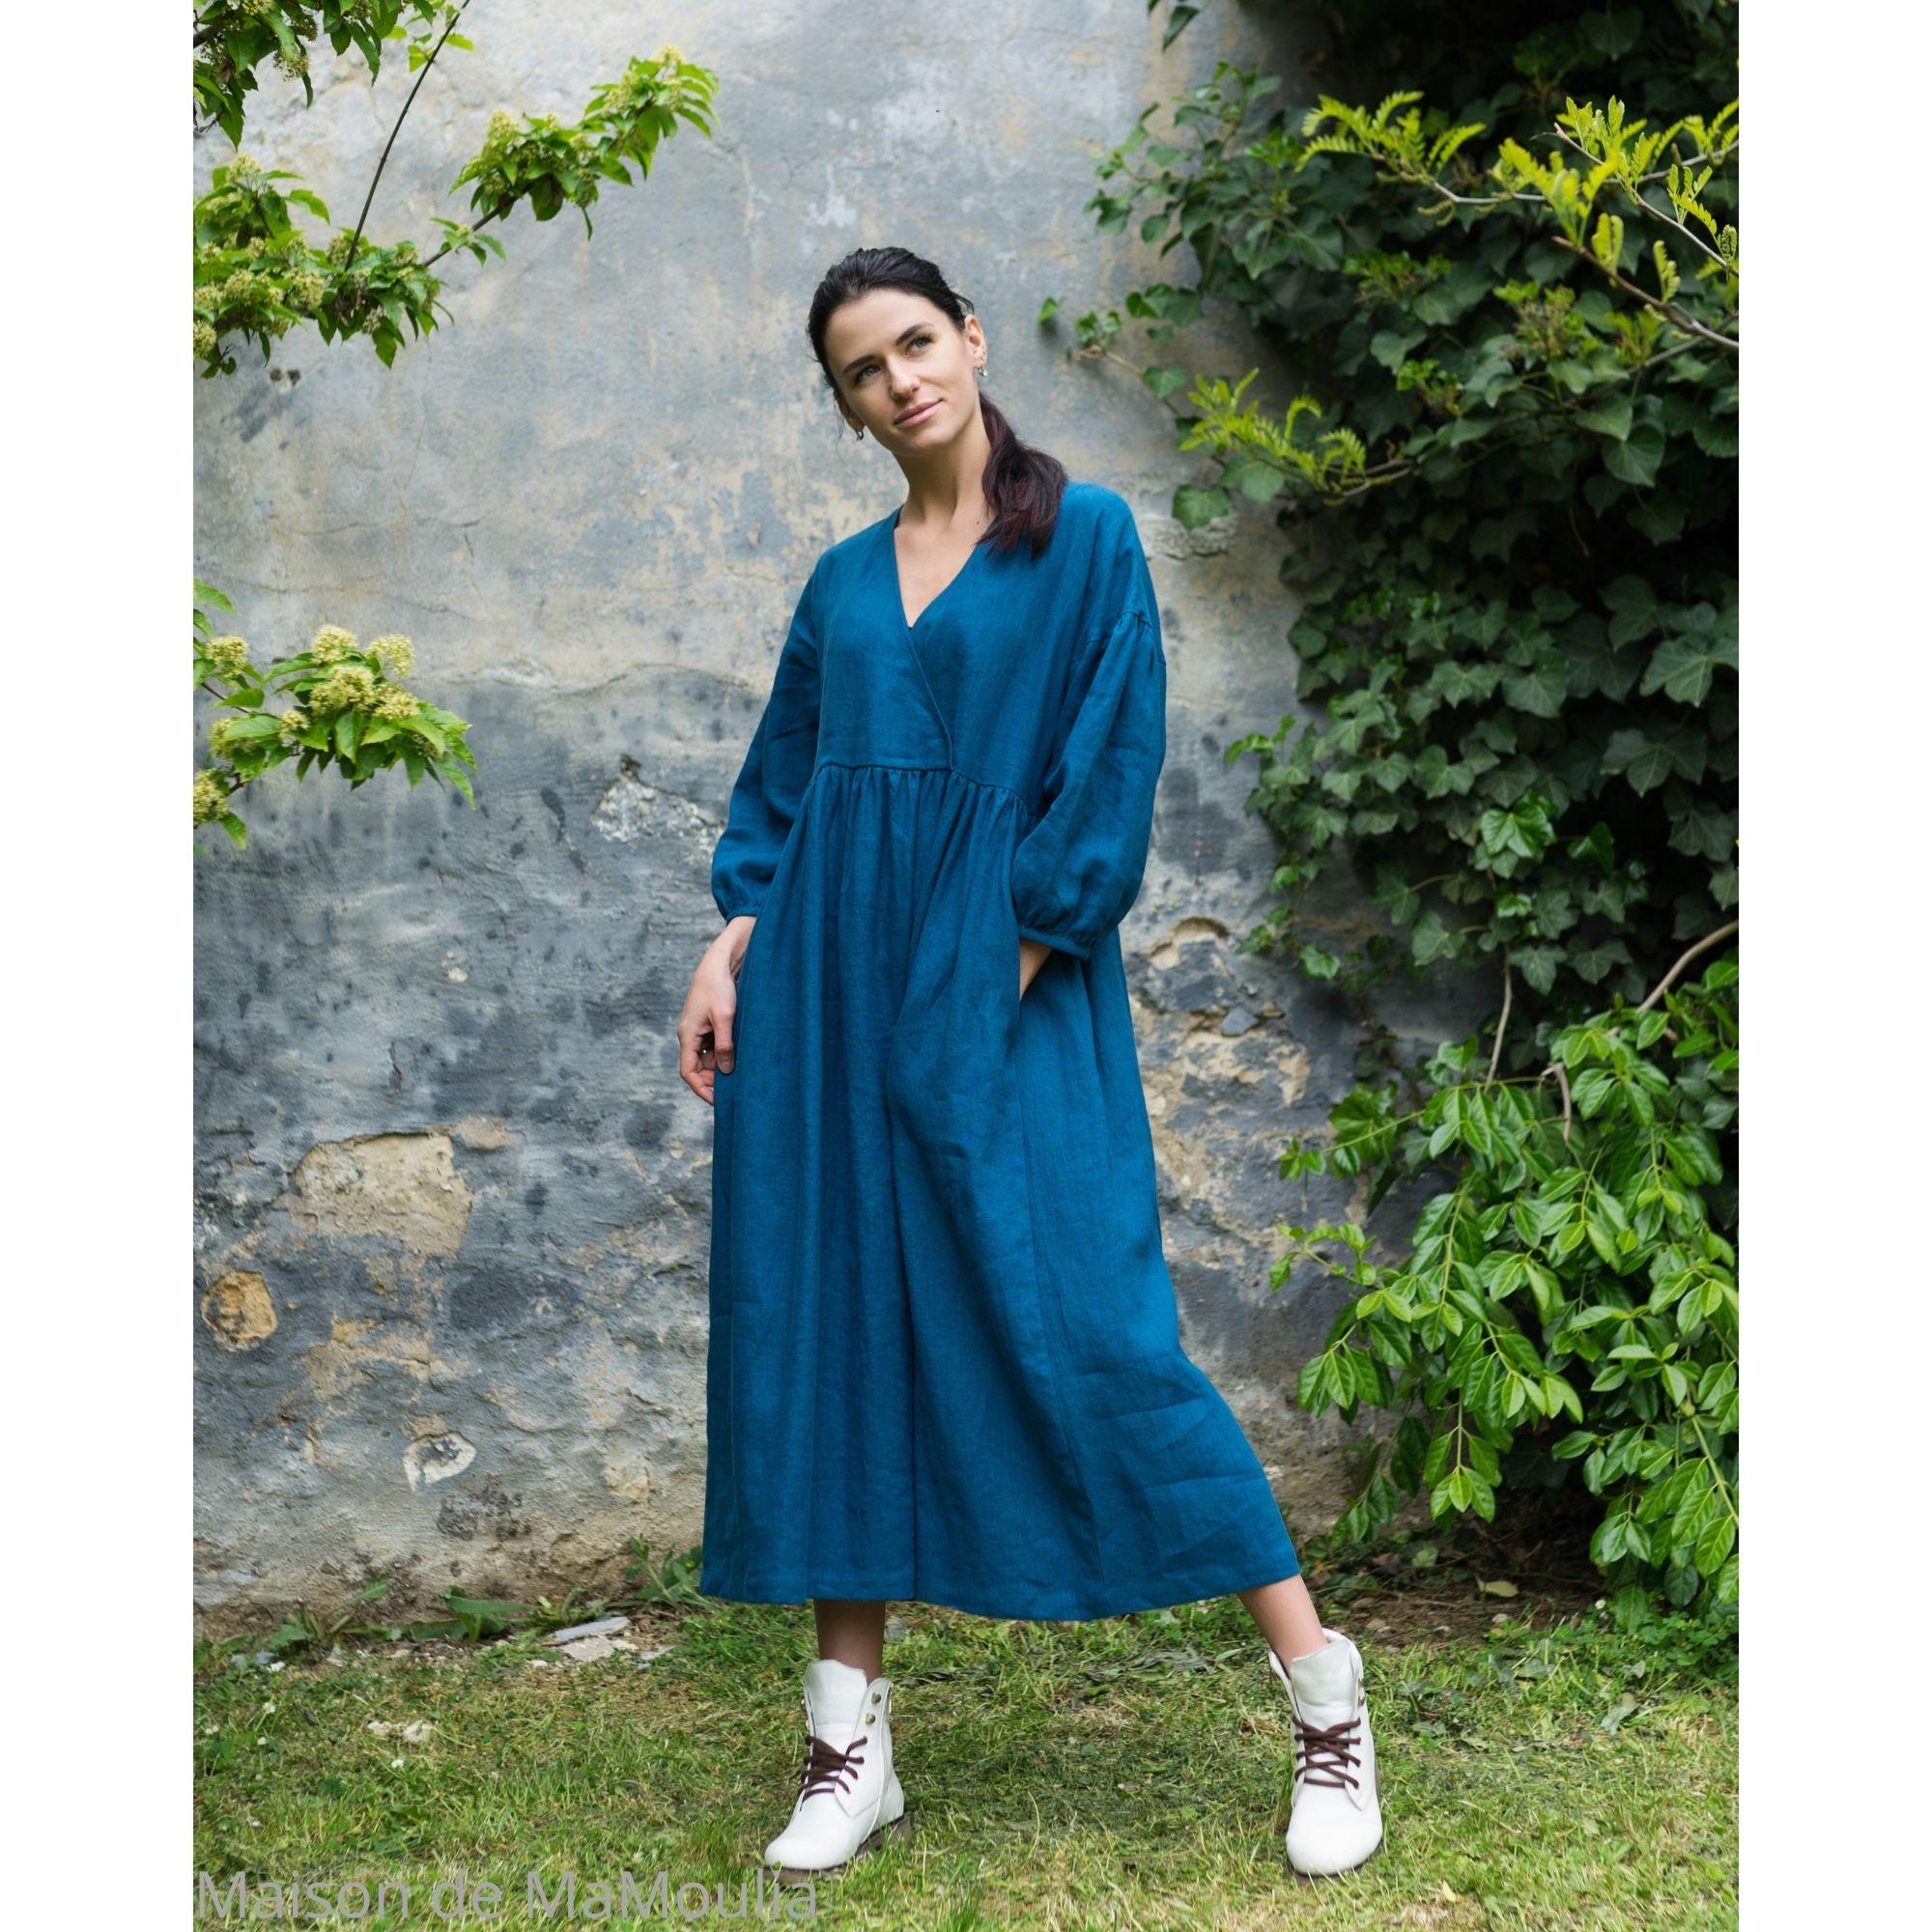 OFFON - Robe longue - col V - 100% lin lavé - bleu canard